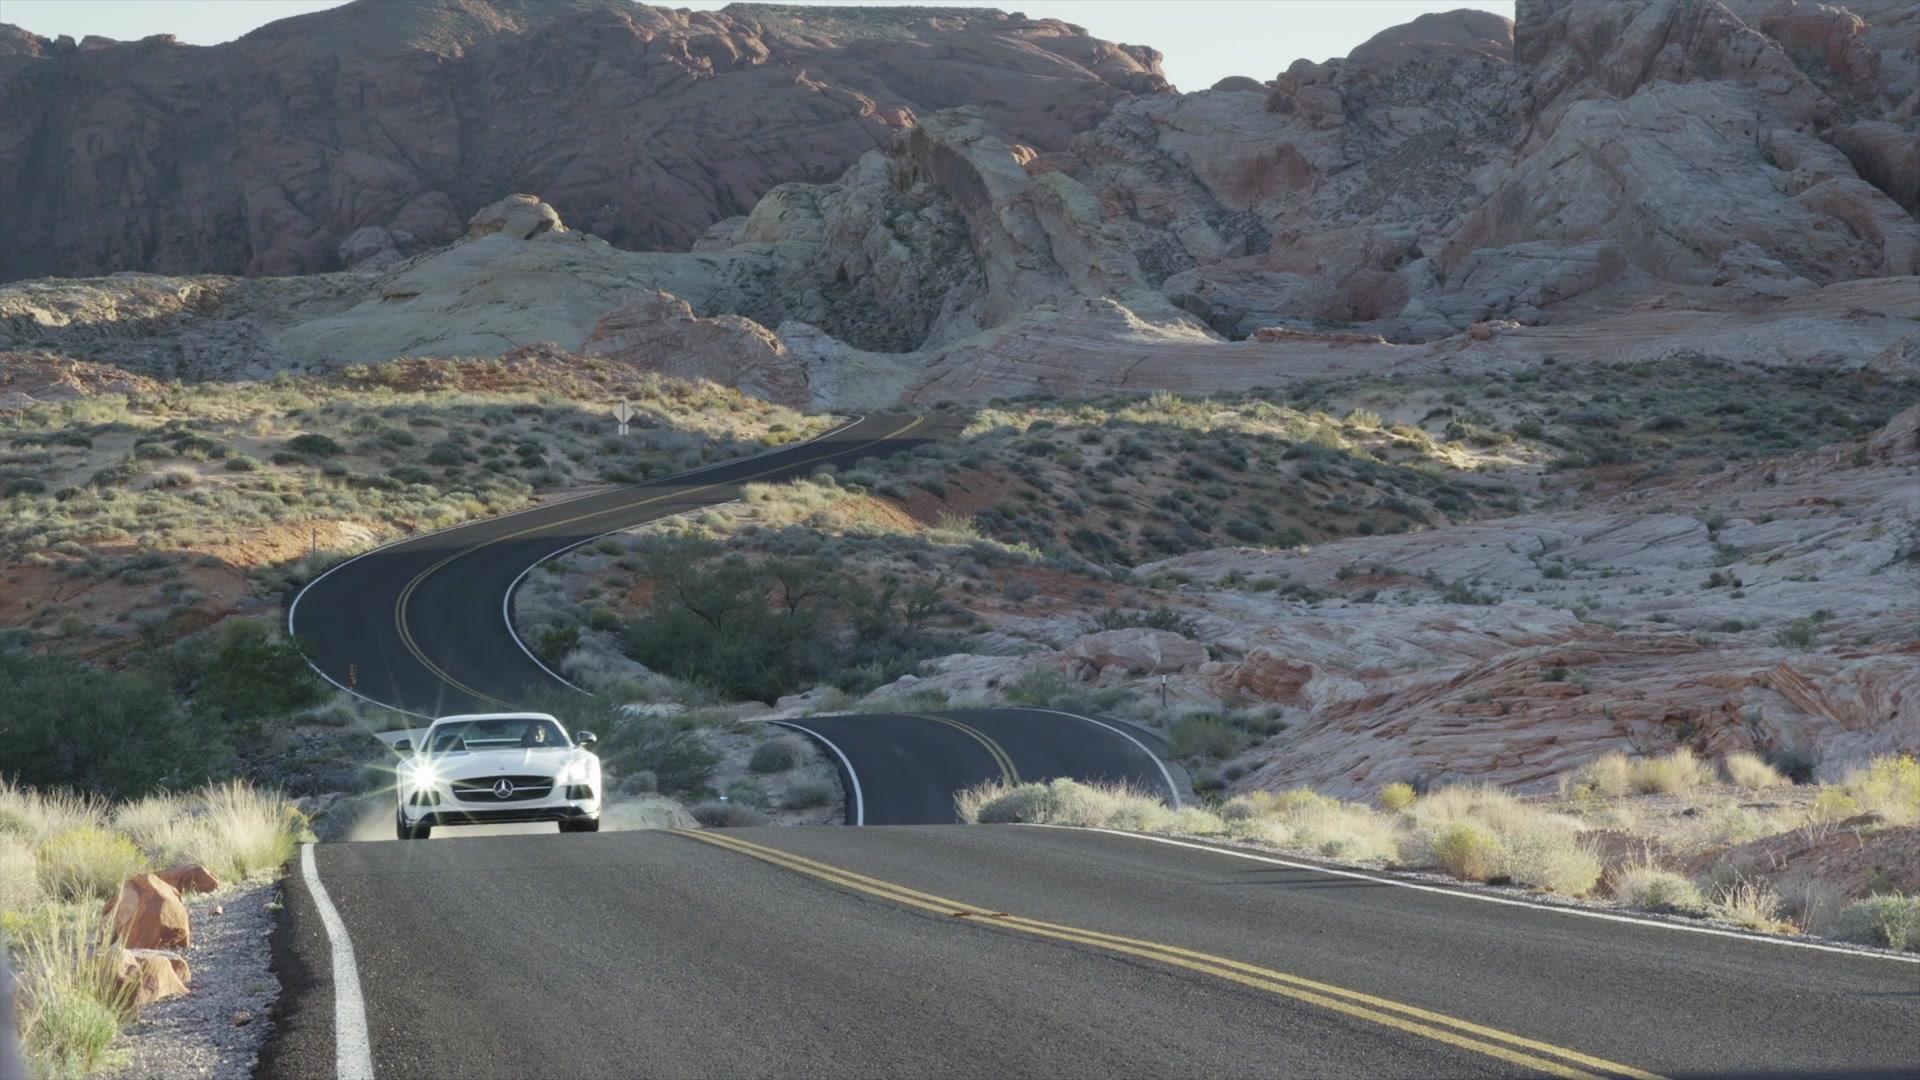 2014MY SLS AMG Black Series - Running Footage